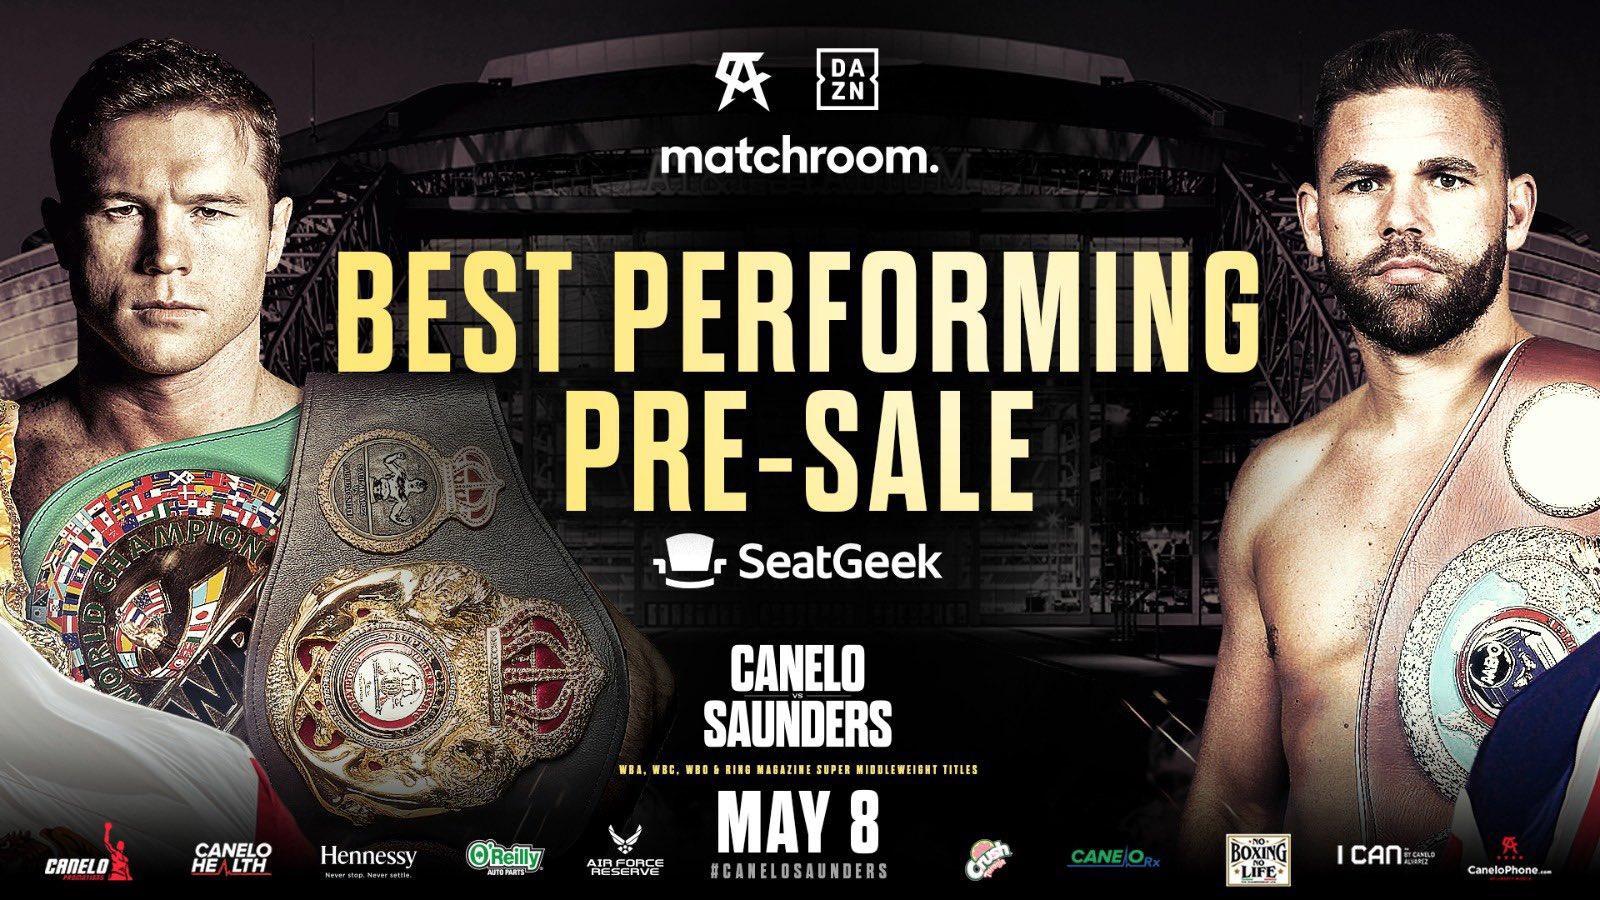 La próxima pelea del Canelo Álvarez será el próximo 8 de mayo